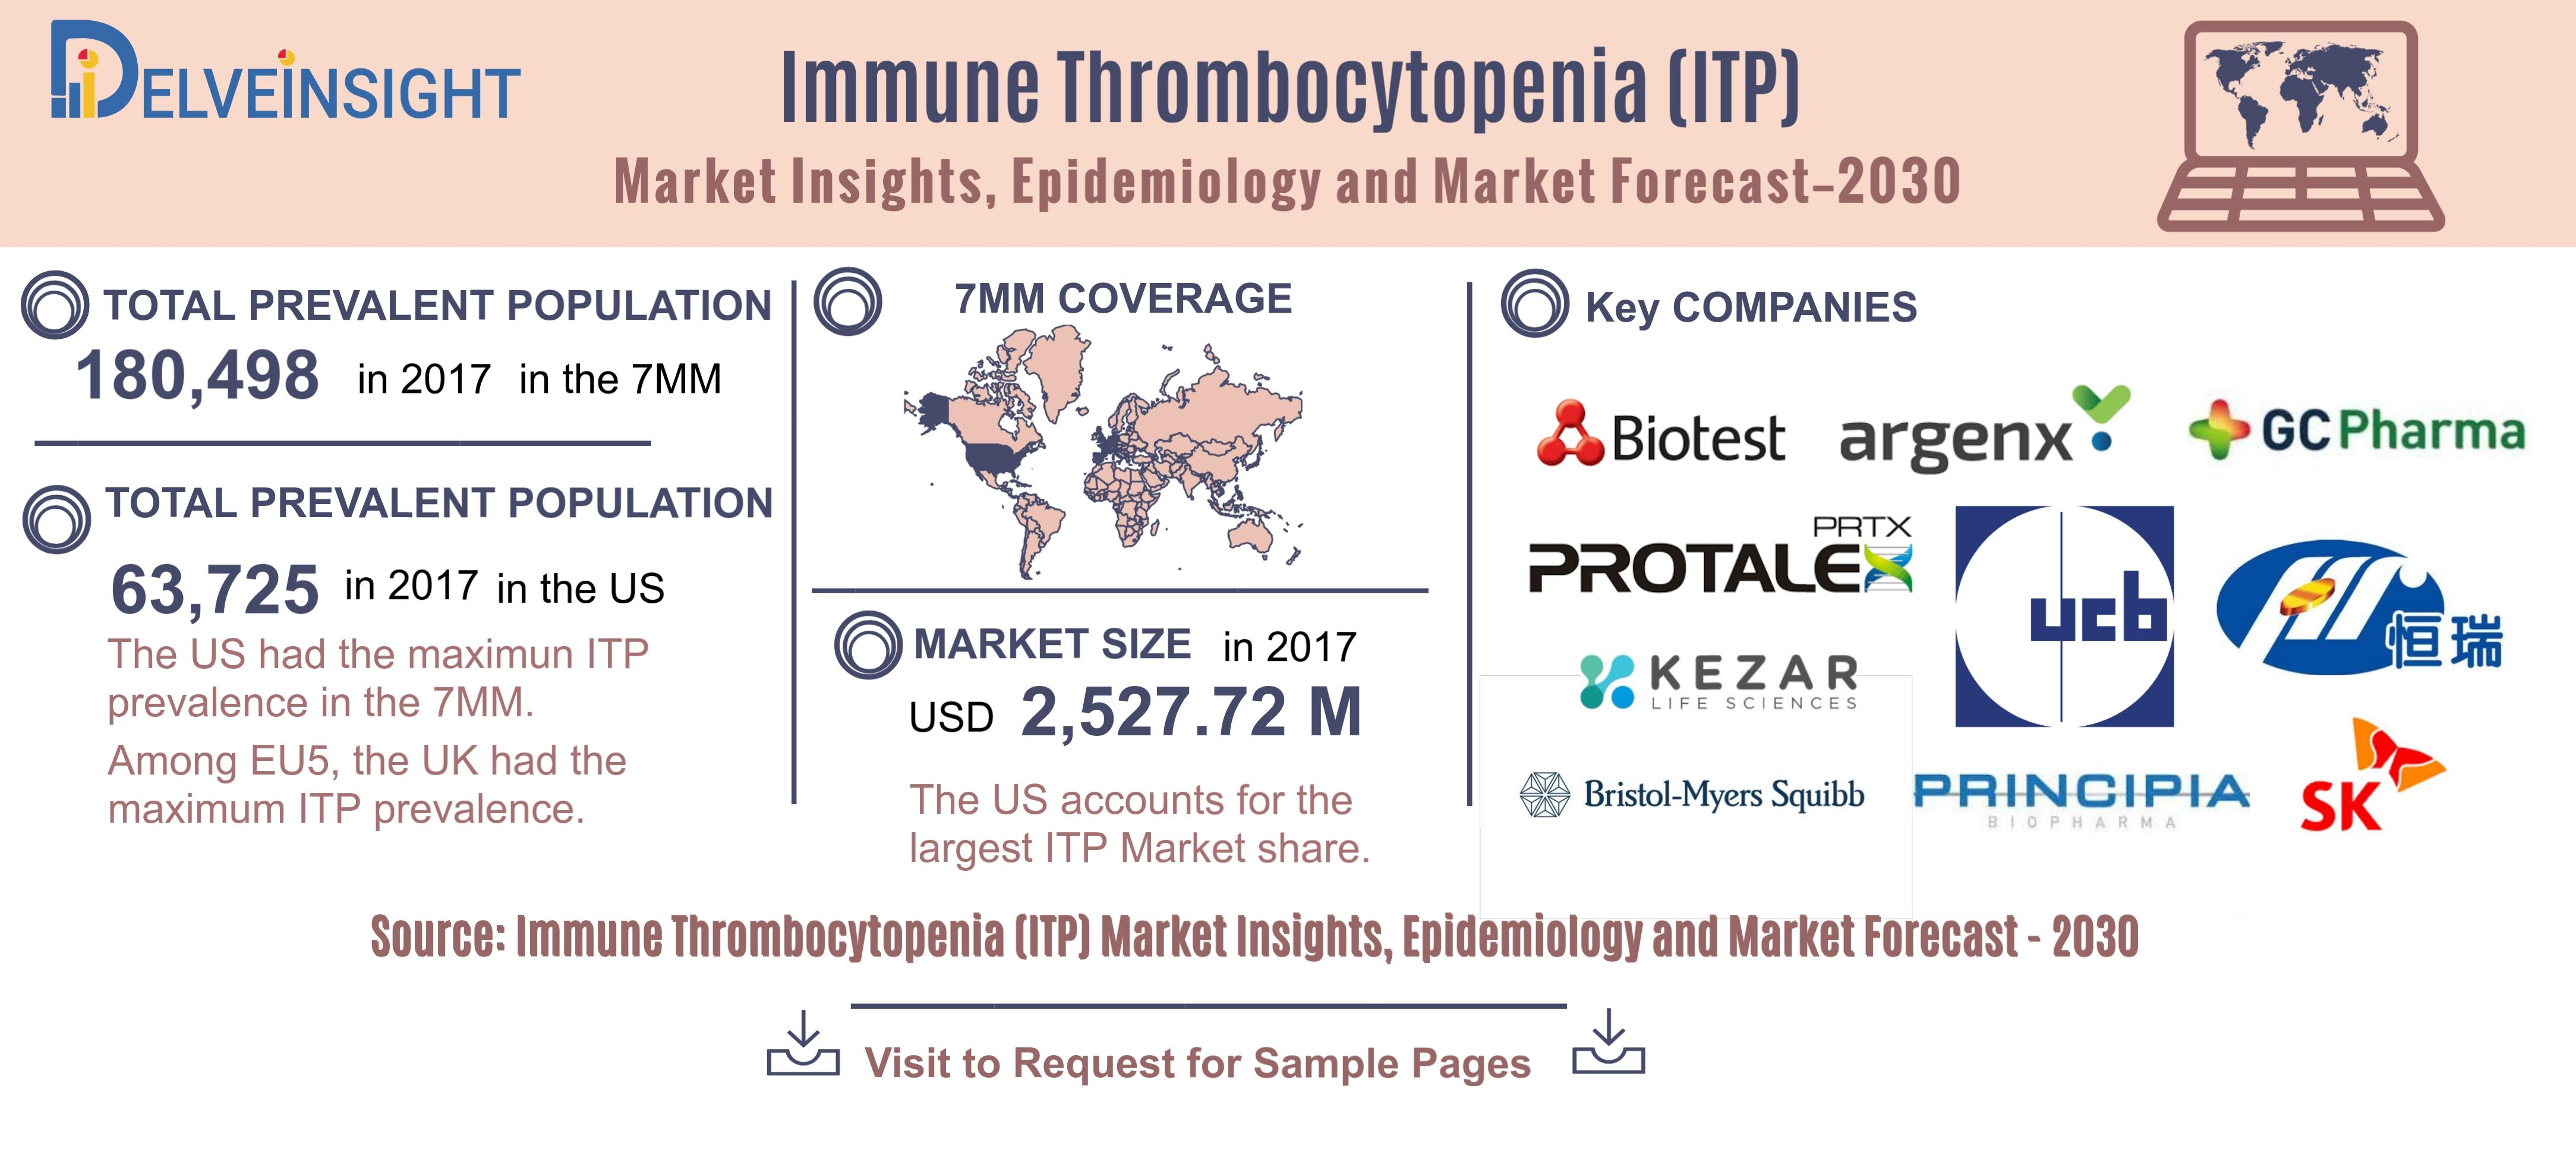 Immune thrombocytopenia Epidemiology Insights, Analysis, and Forecasted Trends -  2017-30